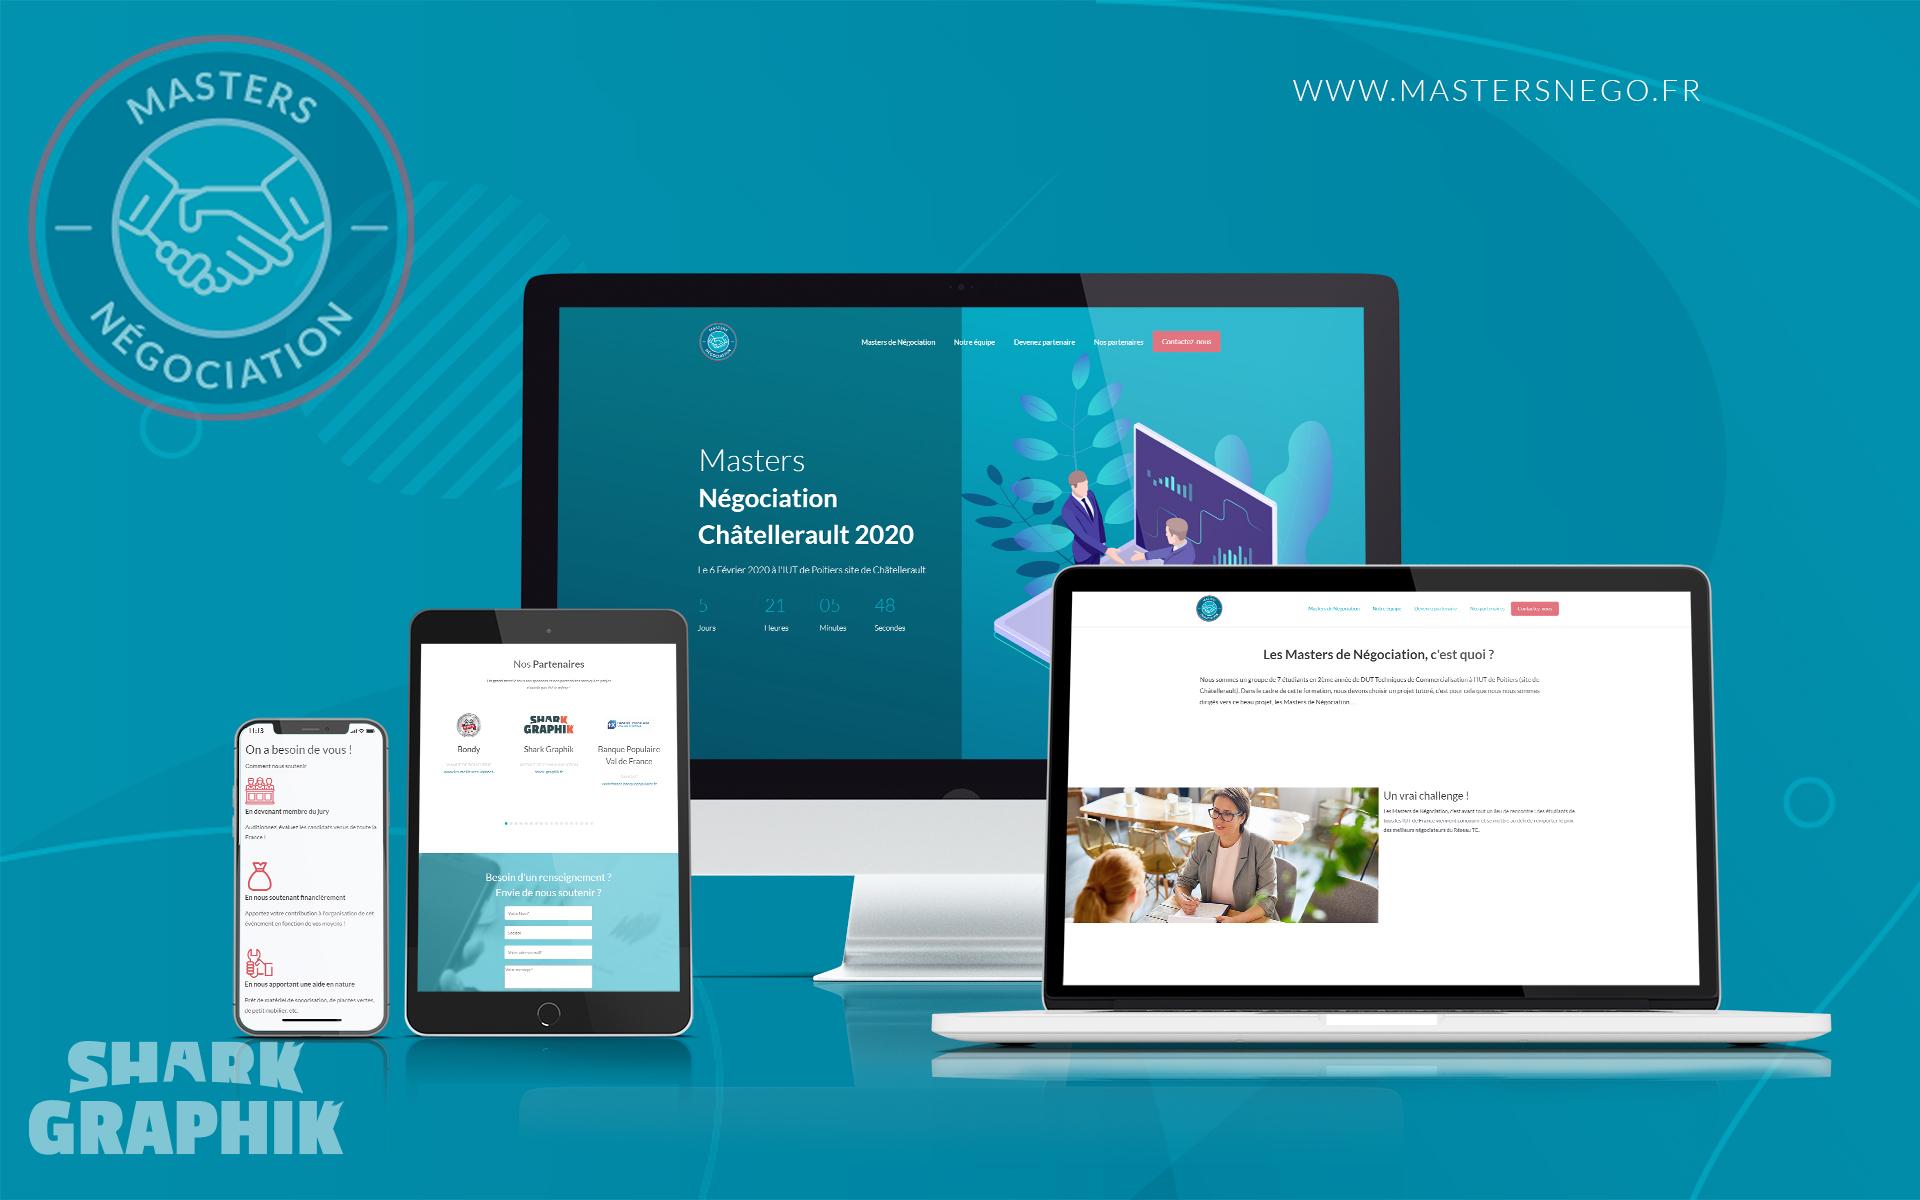 Présentation du site mastersdenego.fr